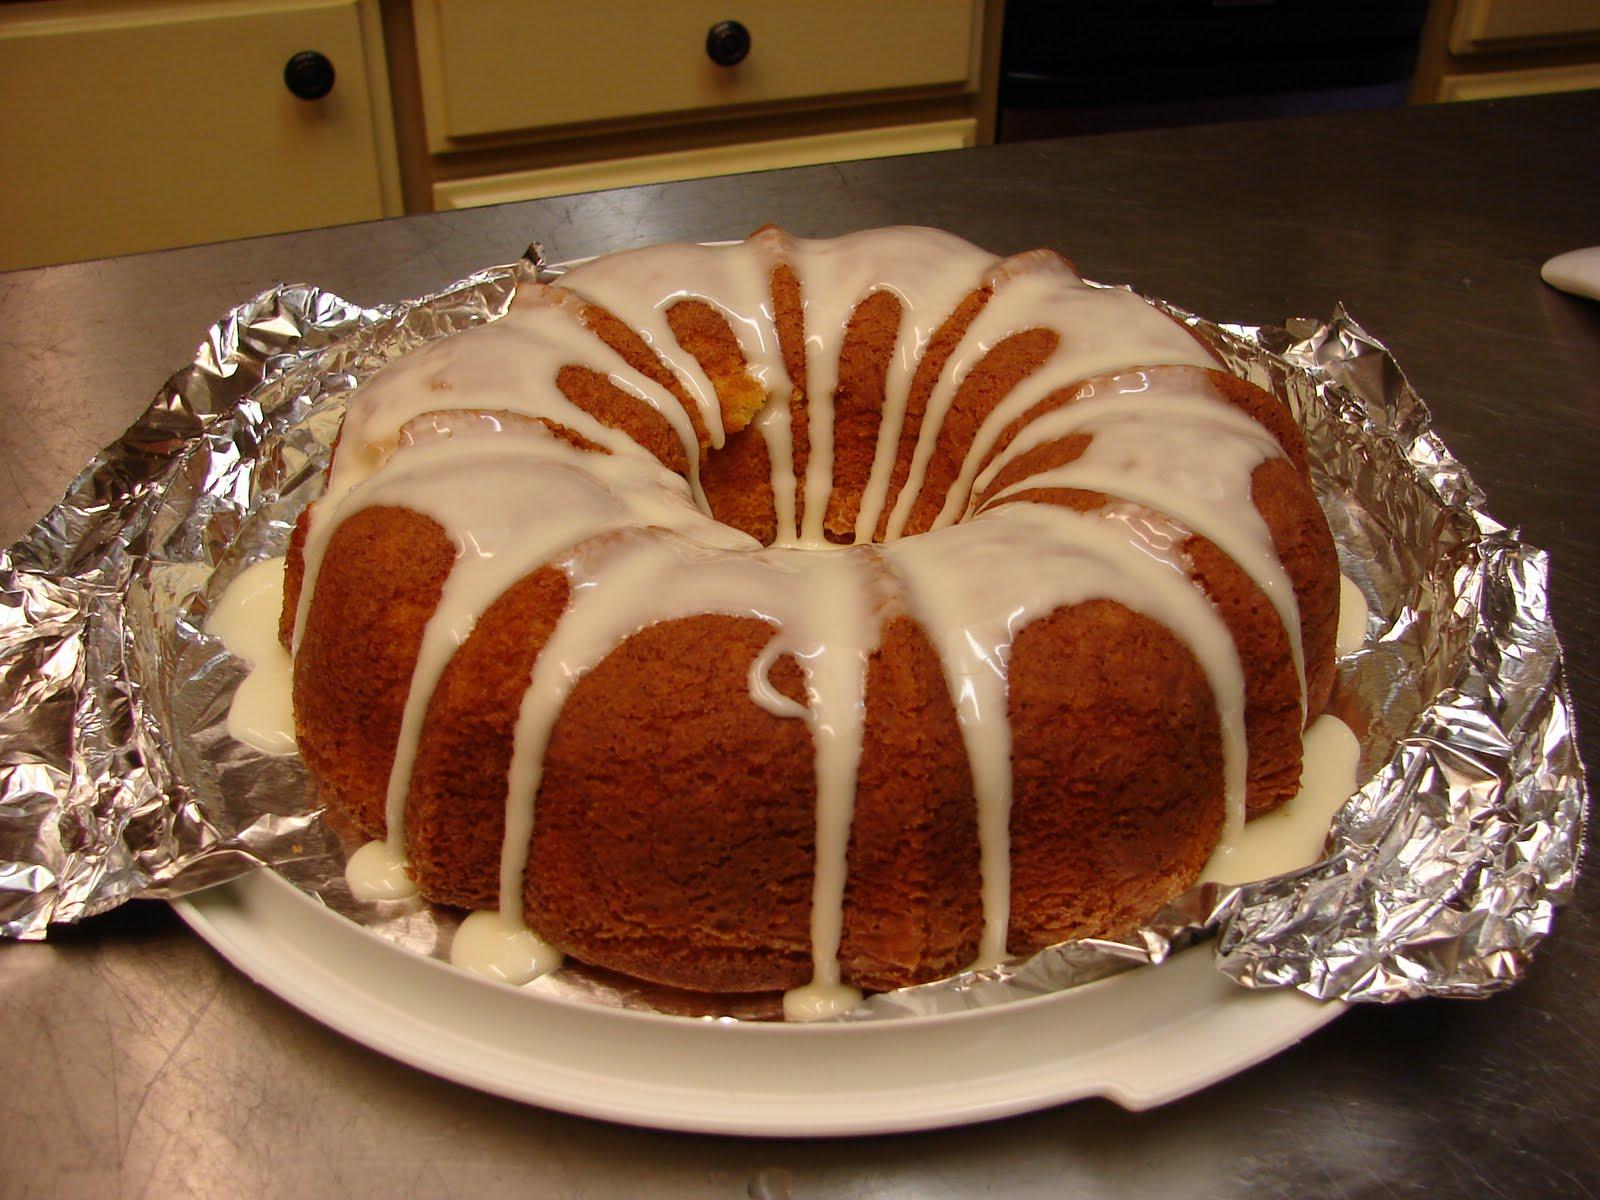 How To Make Harvey Wallbanger Cake